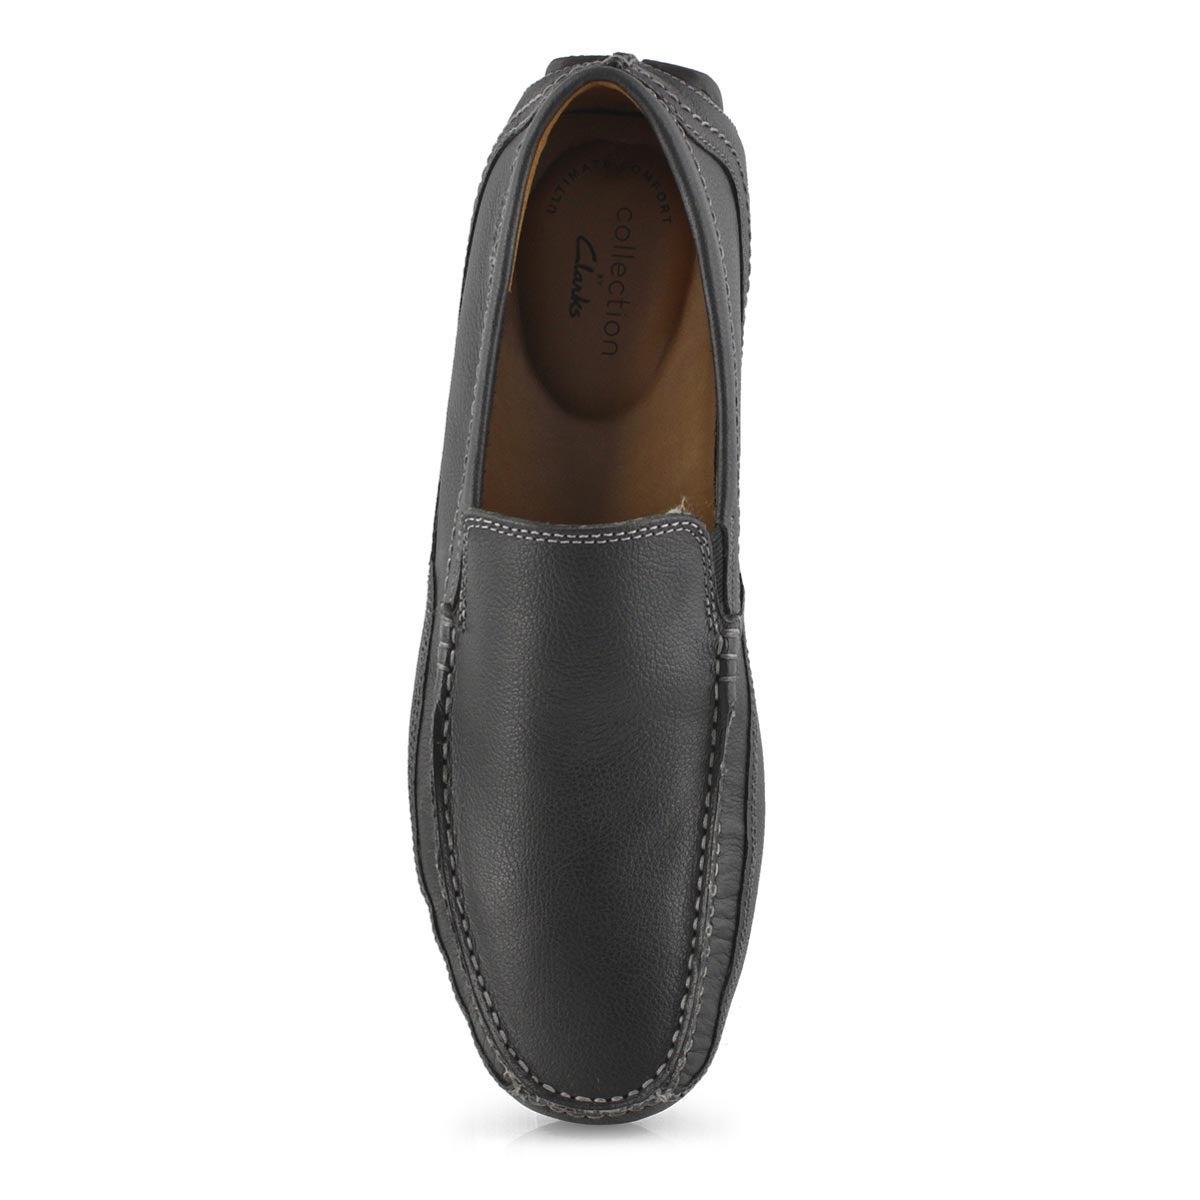 Men's Ashmont Step Dress Shoe - Black